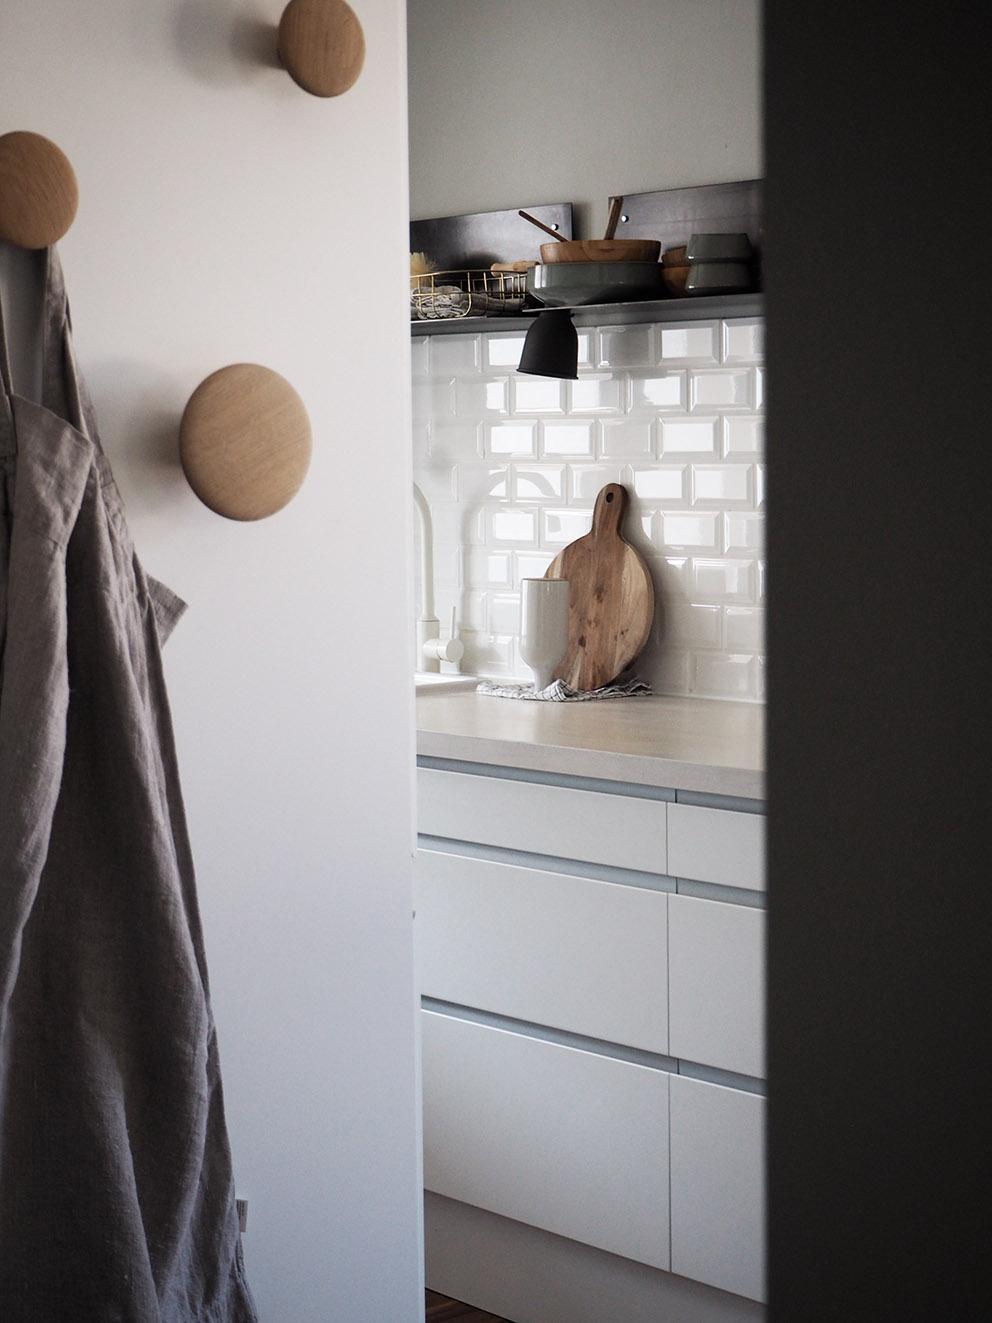 Latexfarbe Kche Full Size Of Wandfarbe Braun Kuche Und